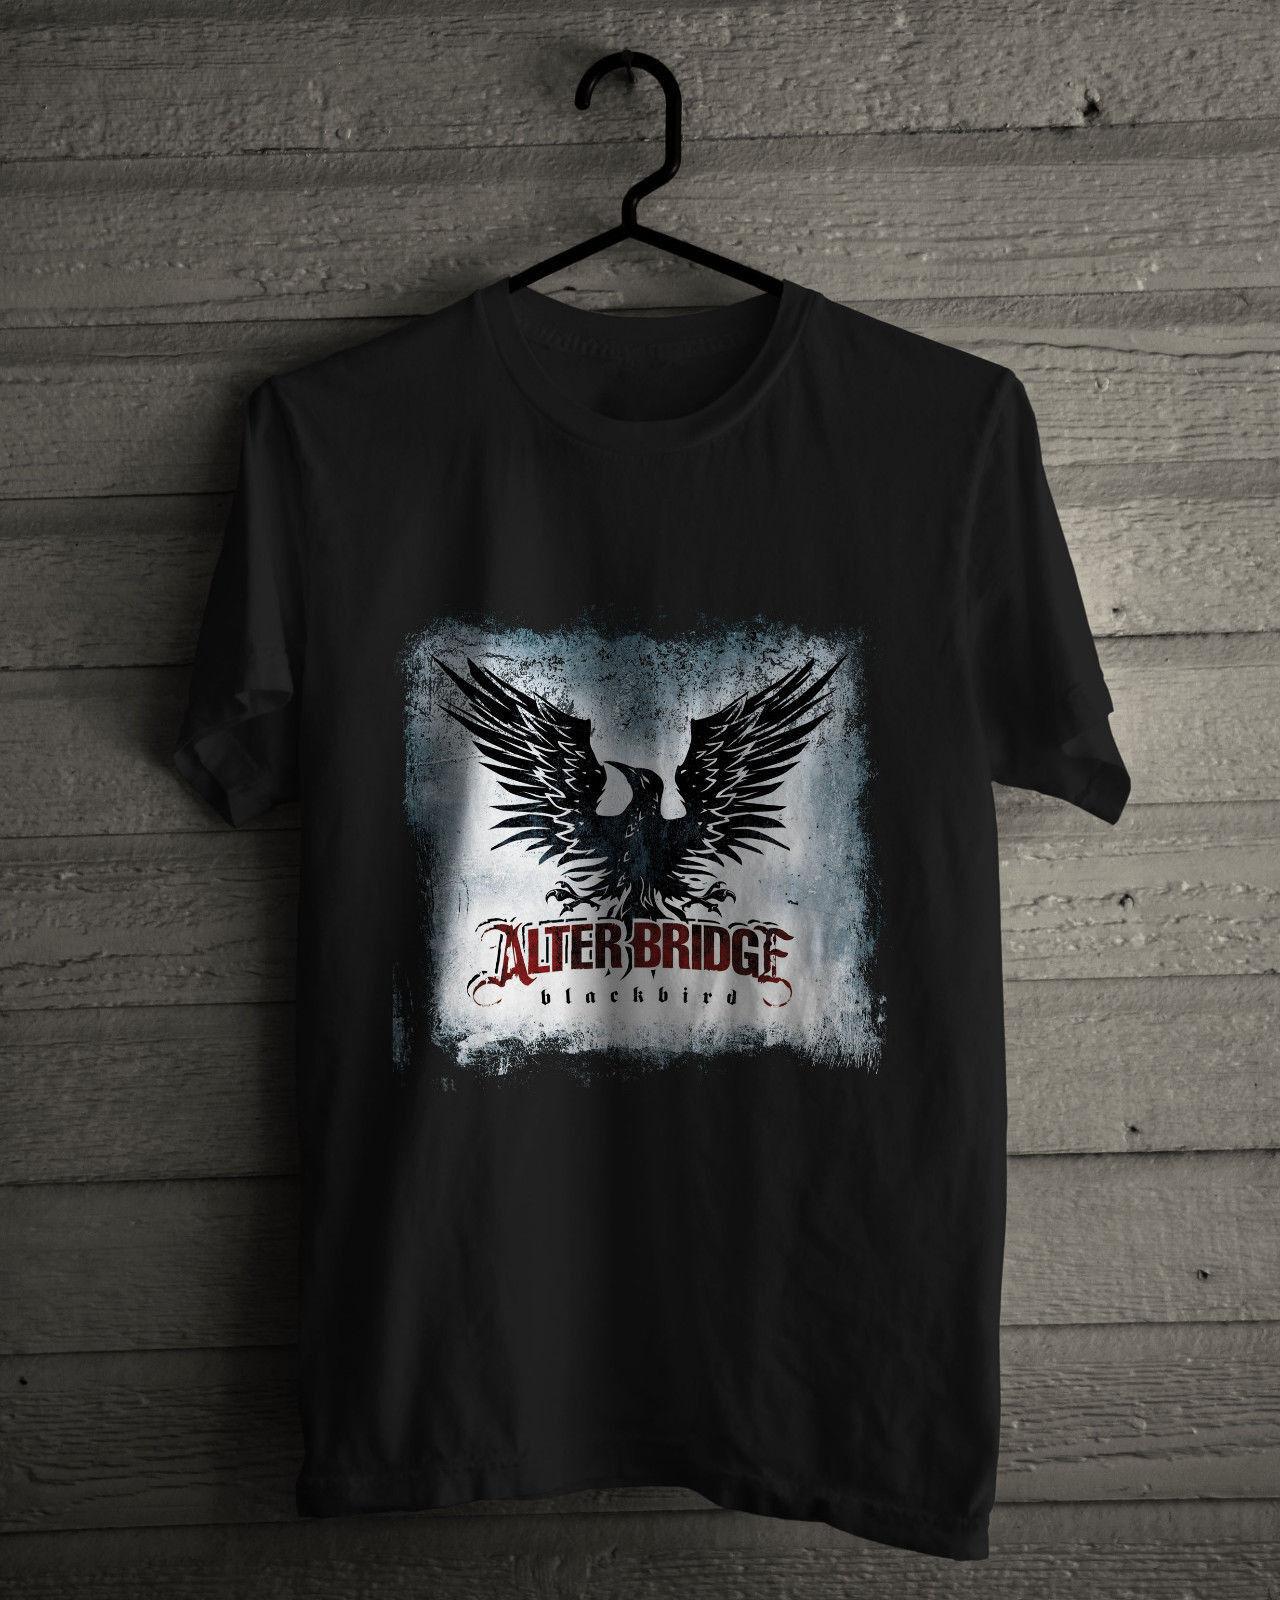 Black t shirt xl - Blackbird Rock Band Black Tee Shirt Size S M L Xl 2xl 3xl